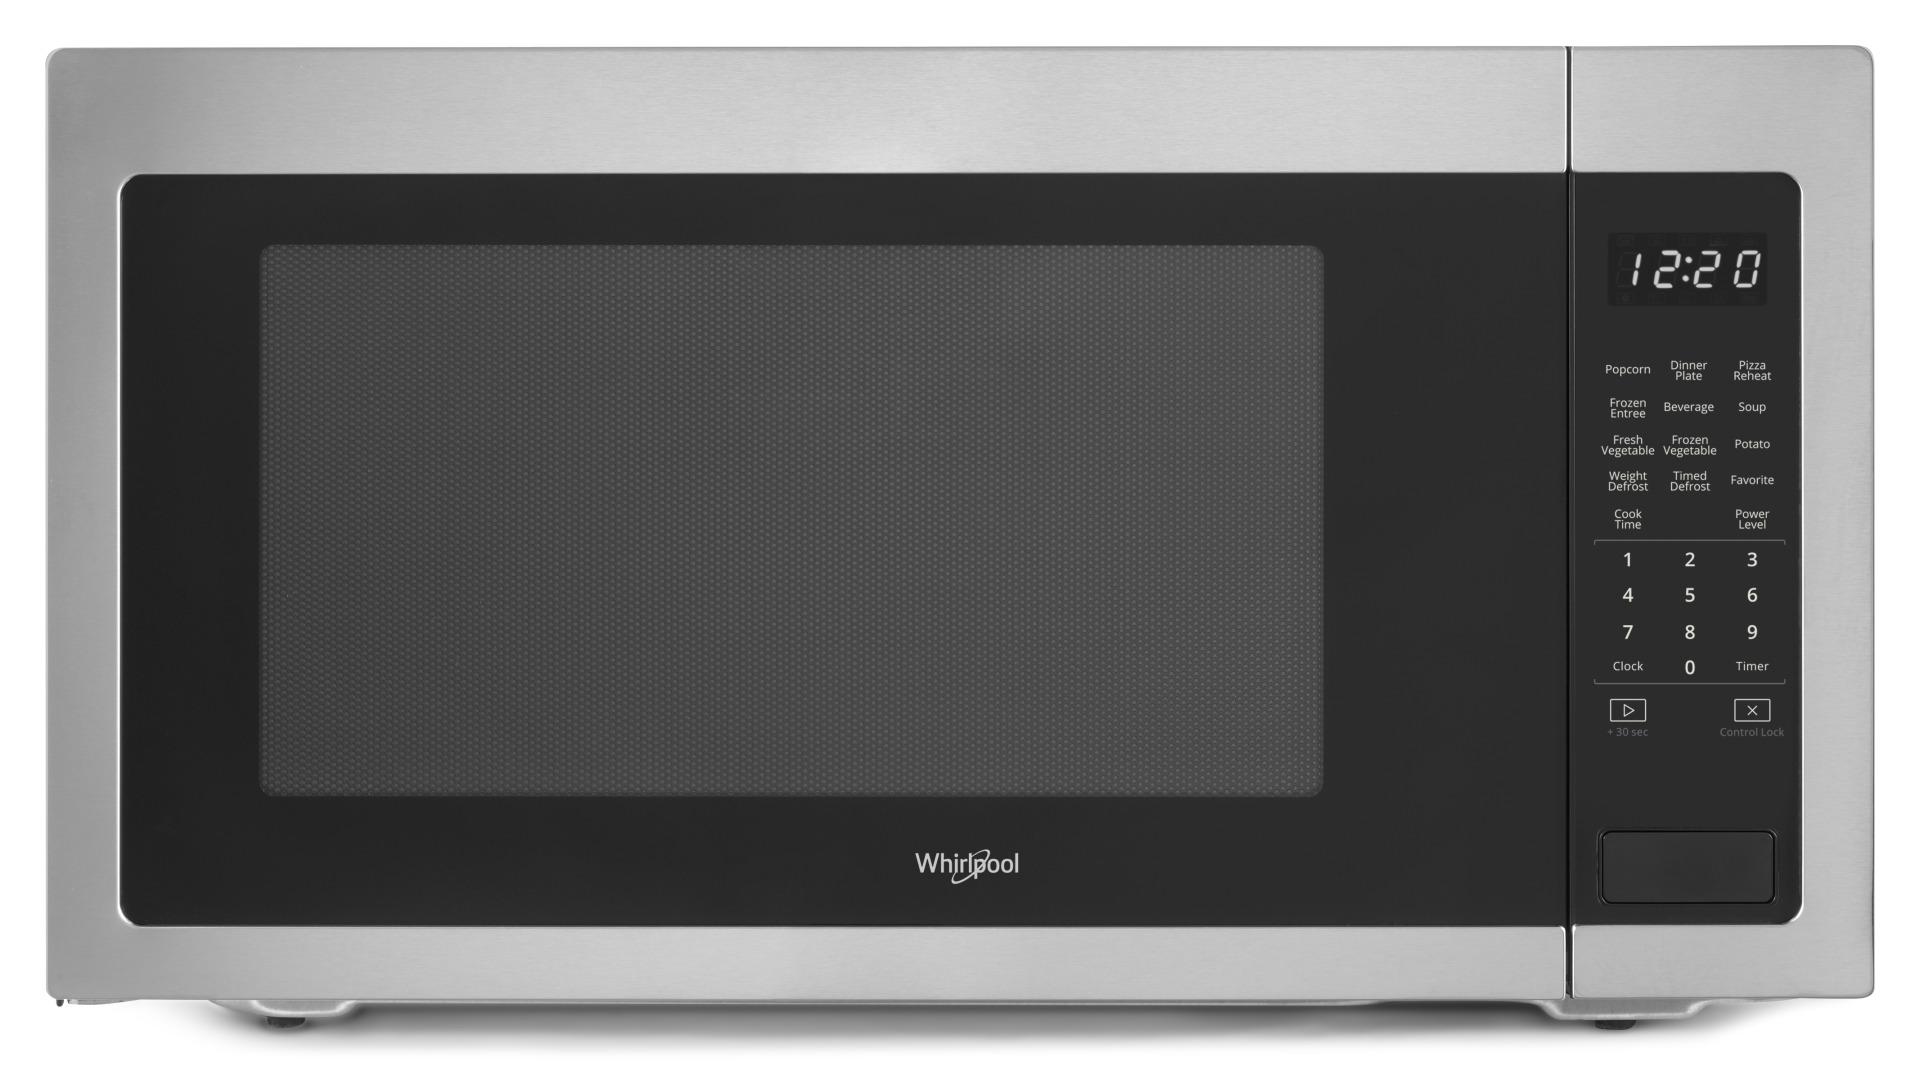 whirlpool 2 2 cu ft countertop microwave in stainless steel nfm